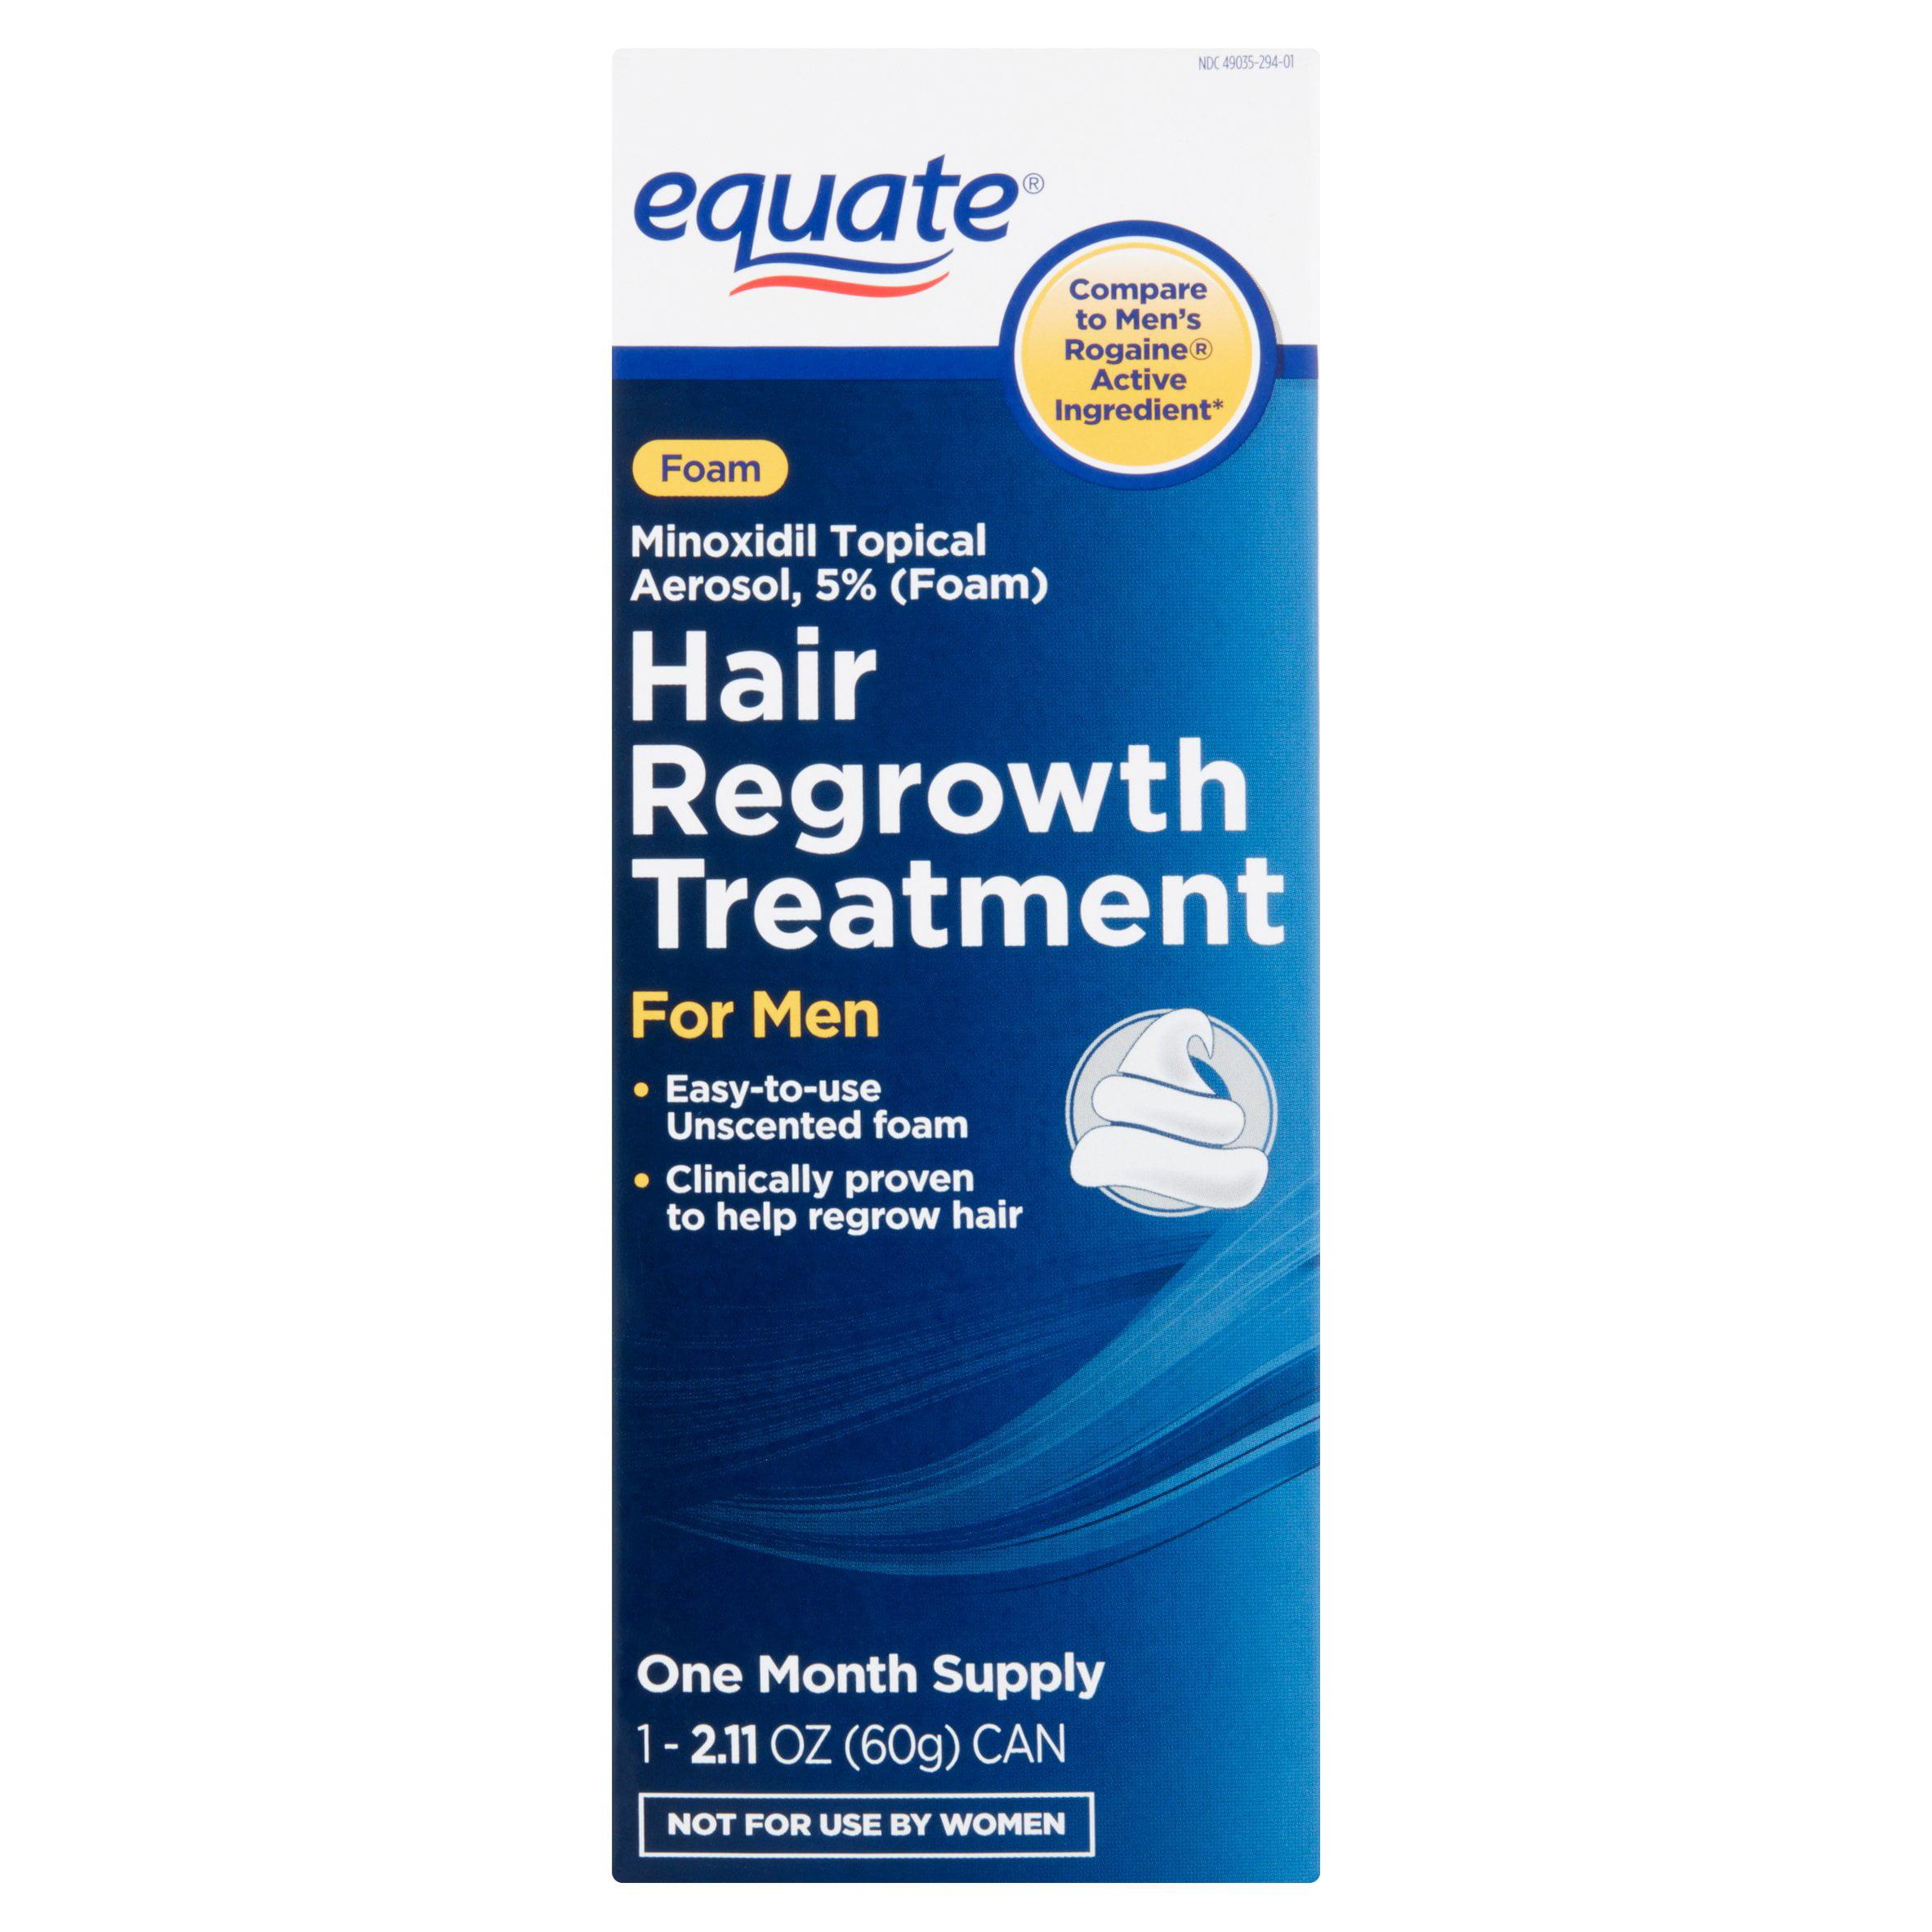 Equate Foam Hair Regrowth Treatment for Men, Foam, Minoxidil Topical Aerosol, 2.11 oz